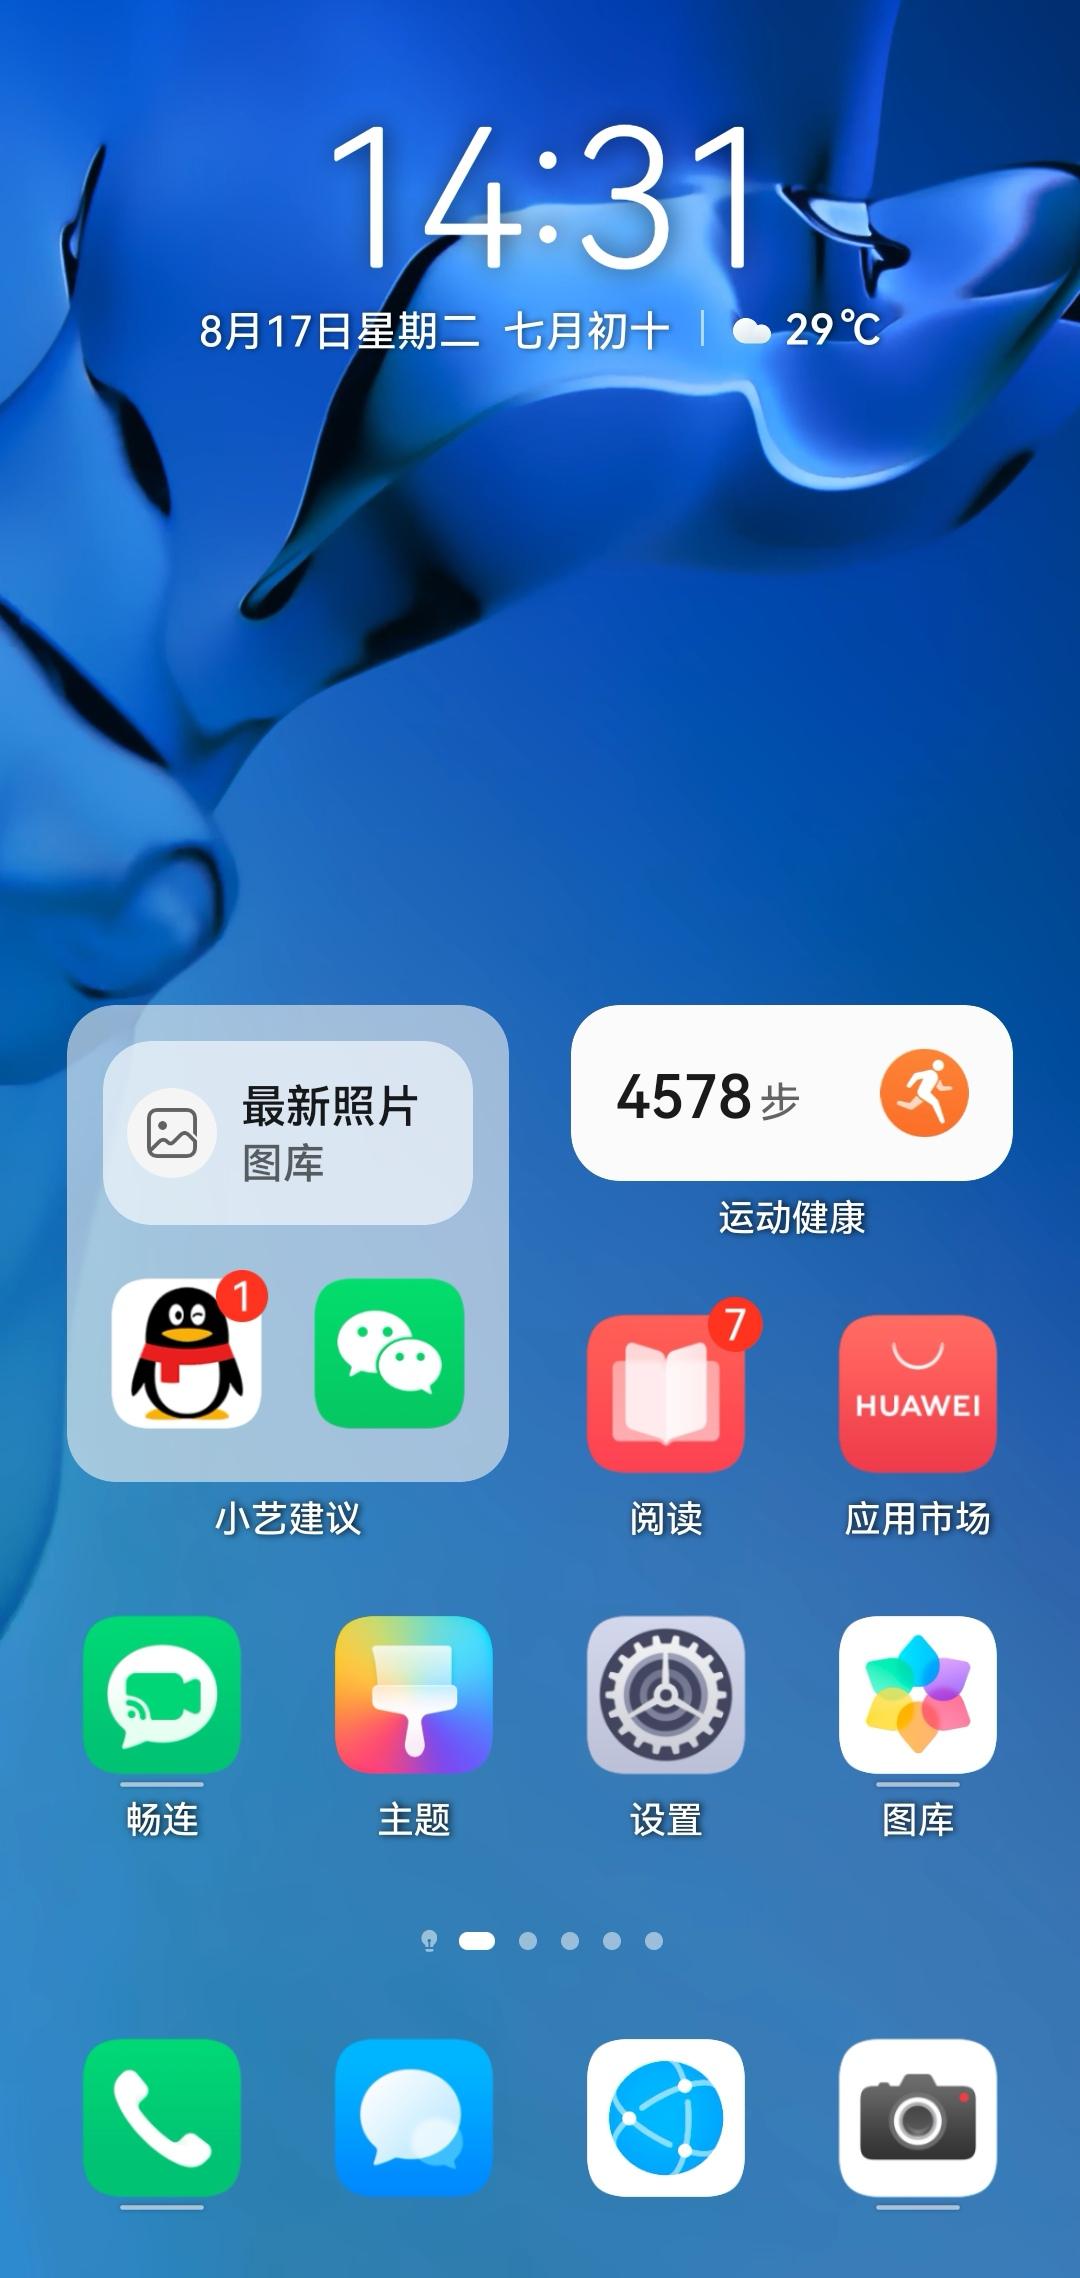 Screenshot_20210817_143125_com.huawei.android.launcher_edit_243890492919035.jpg